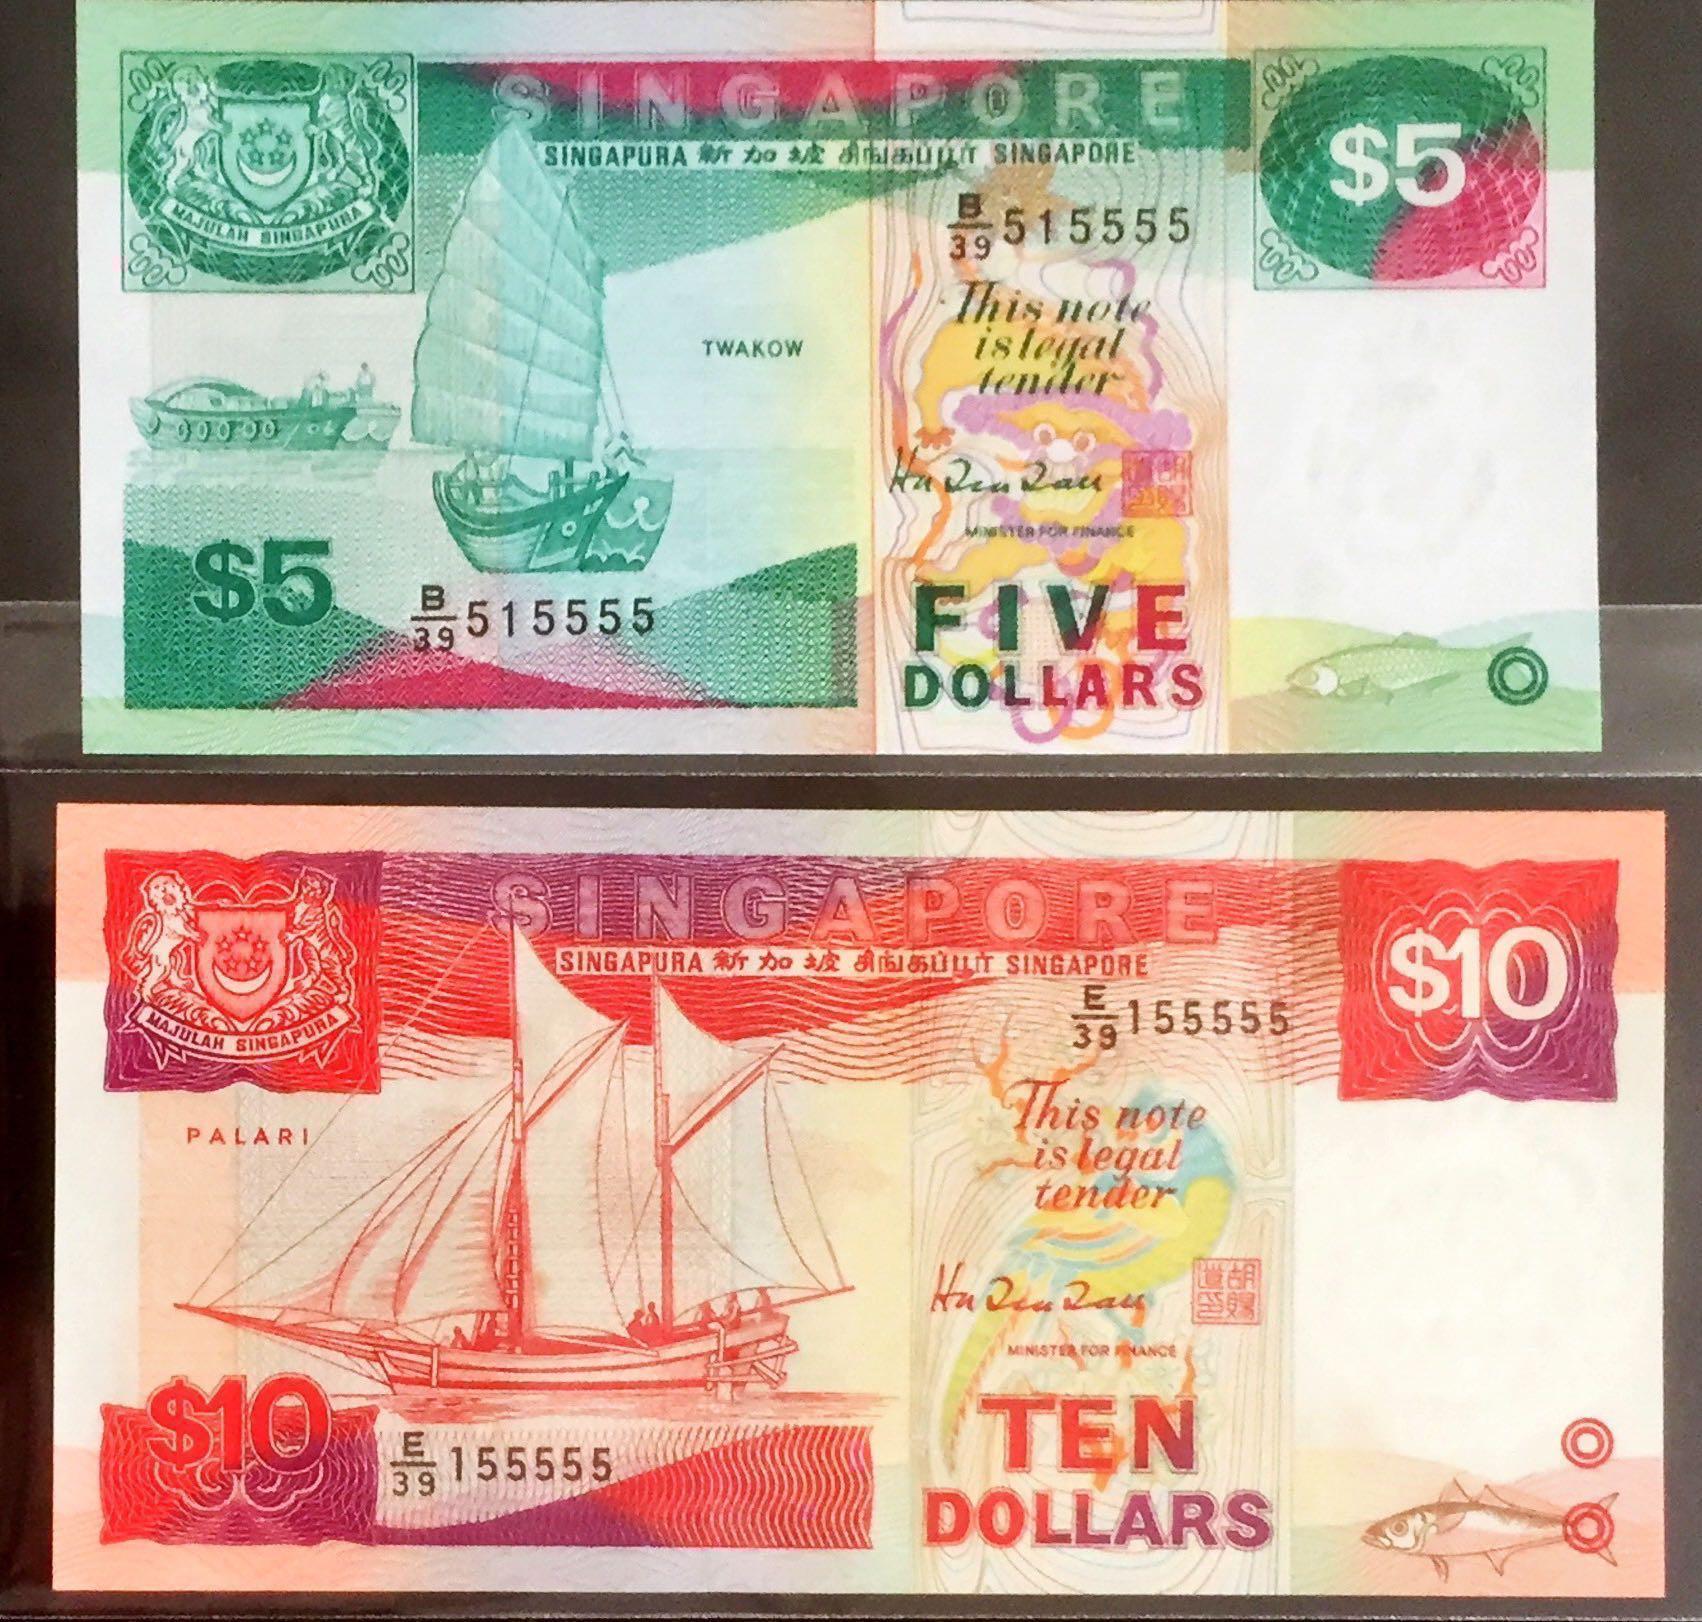 1967 CANADIAN 1 DOLLAR NOTE VERY NICE CRISP UNC